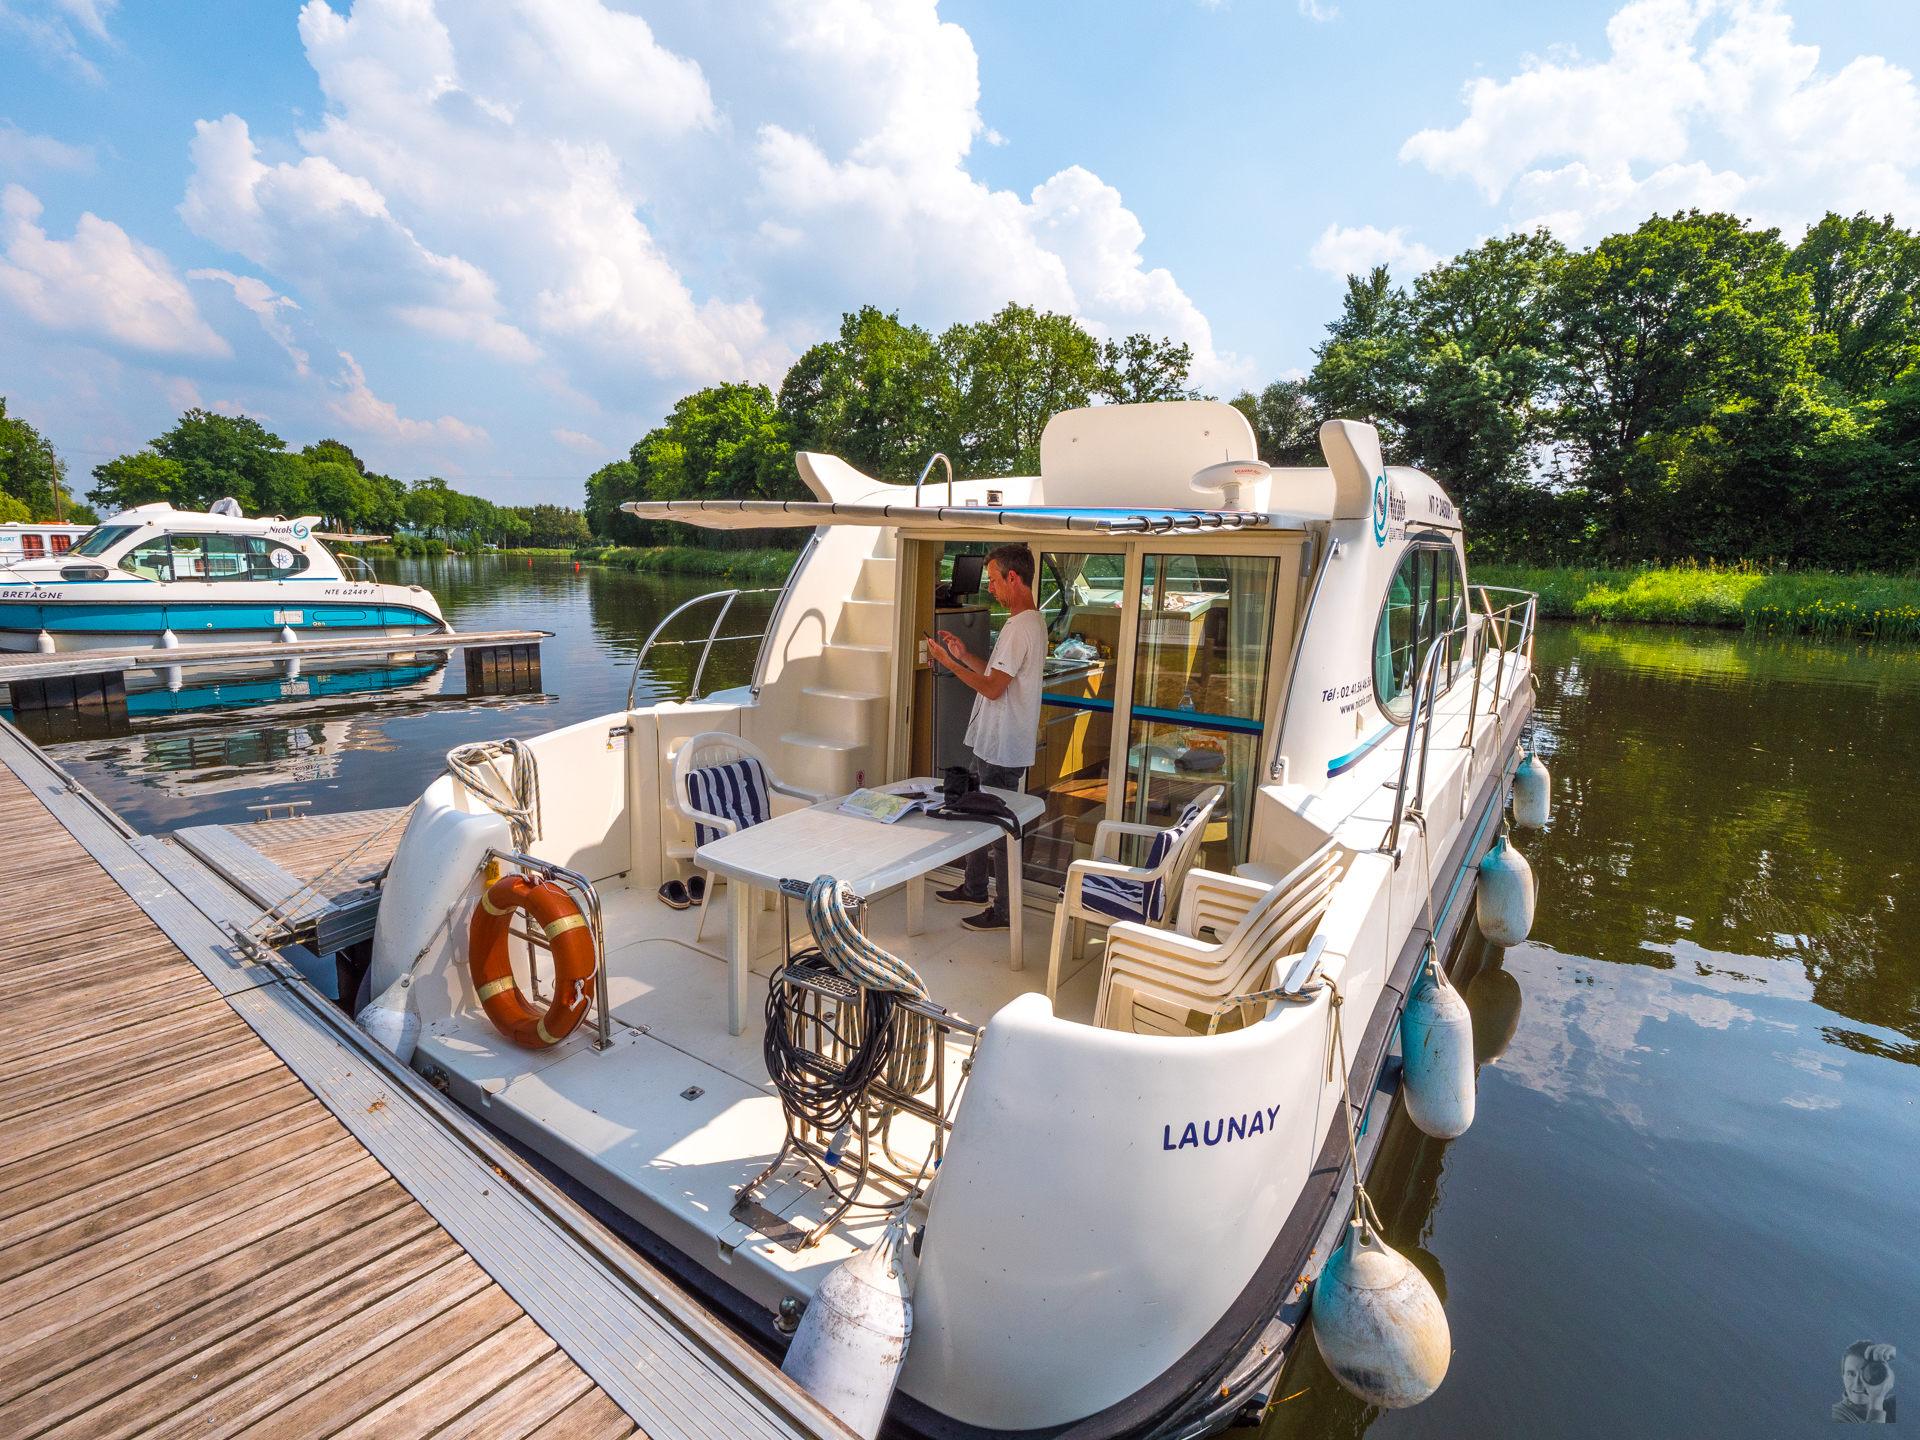 Hausbooturlaub 2018-Glénac/Bretagne-Locaboat Basis in St-Martin-sur-Oust